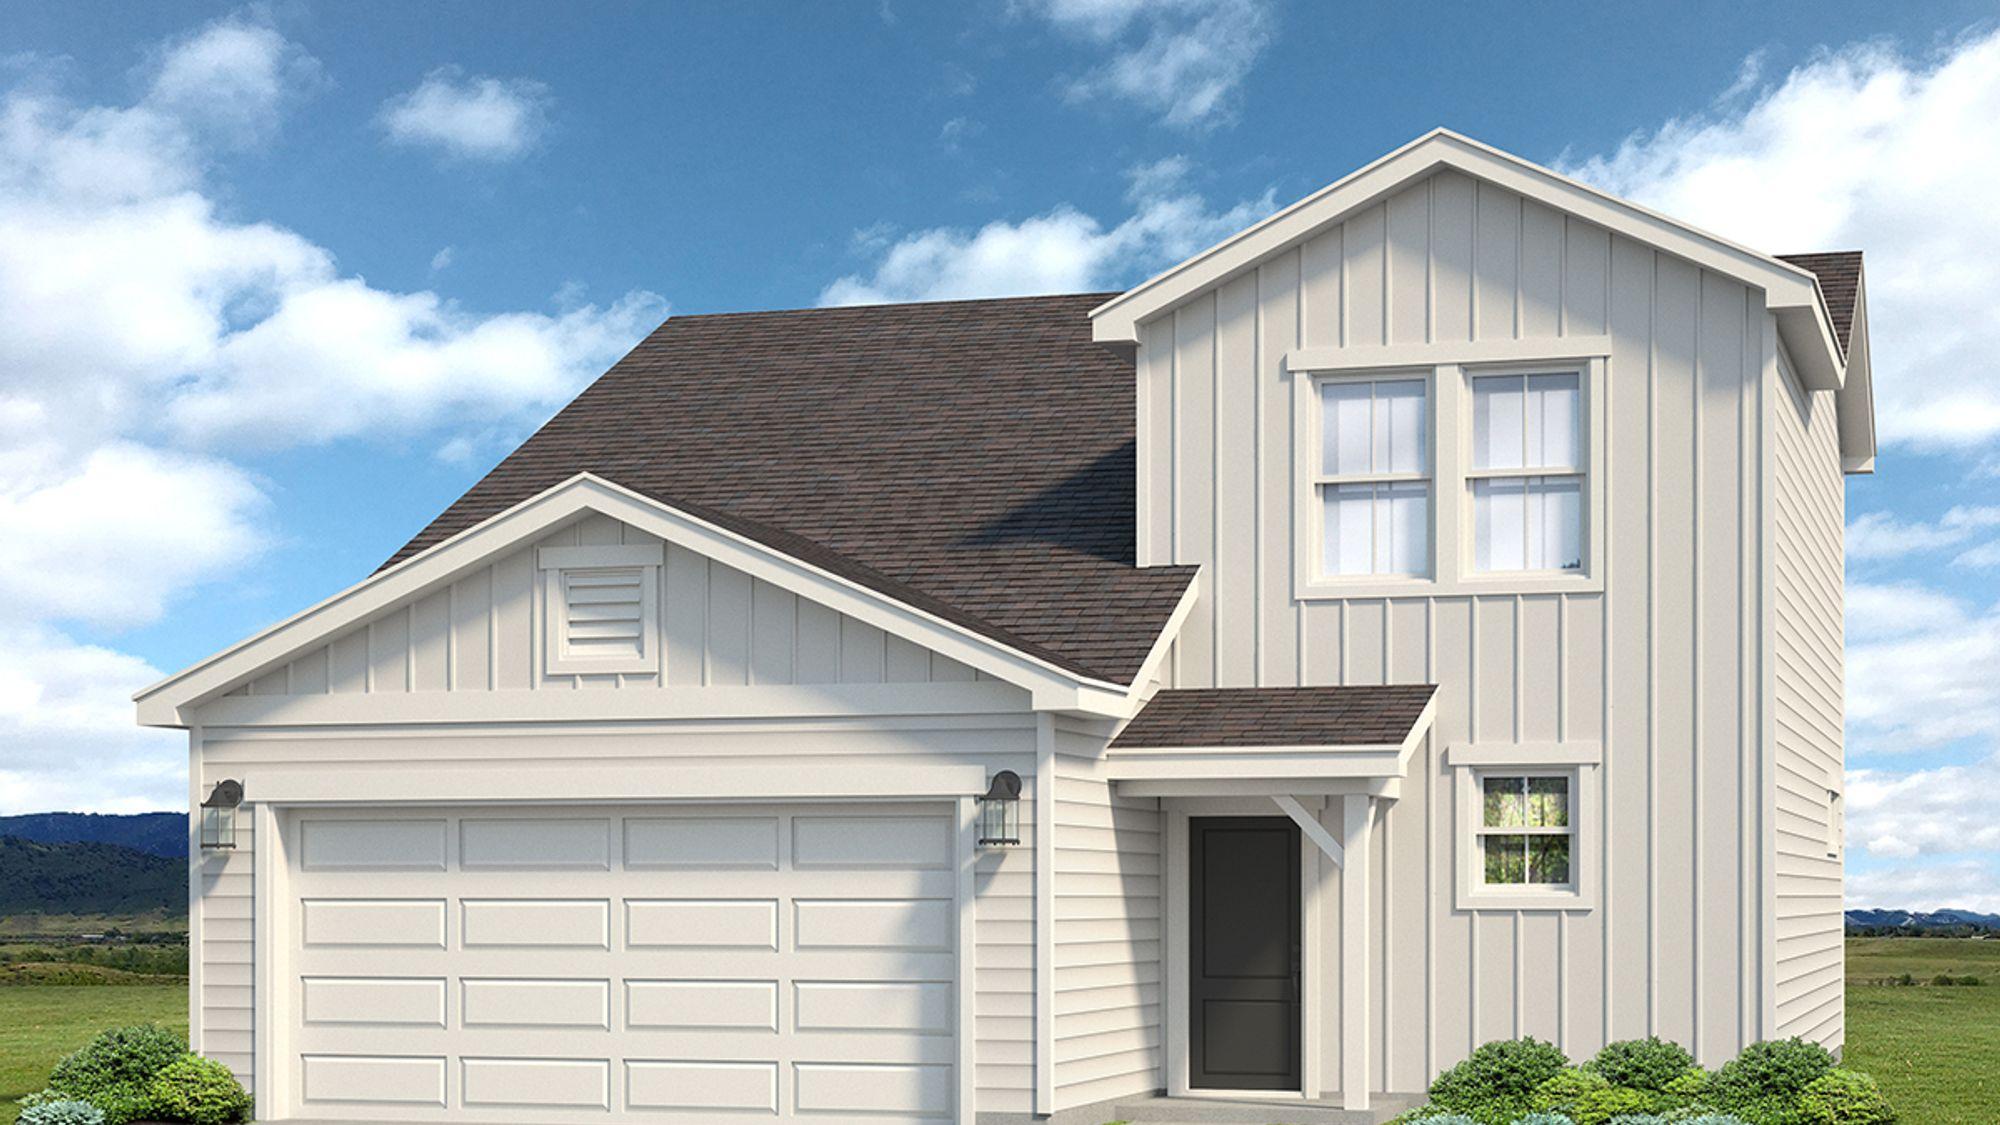 Lindon 504A - Farmhouse Elevation - Example